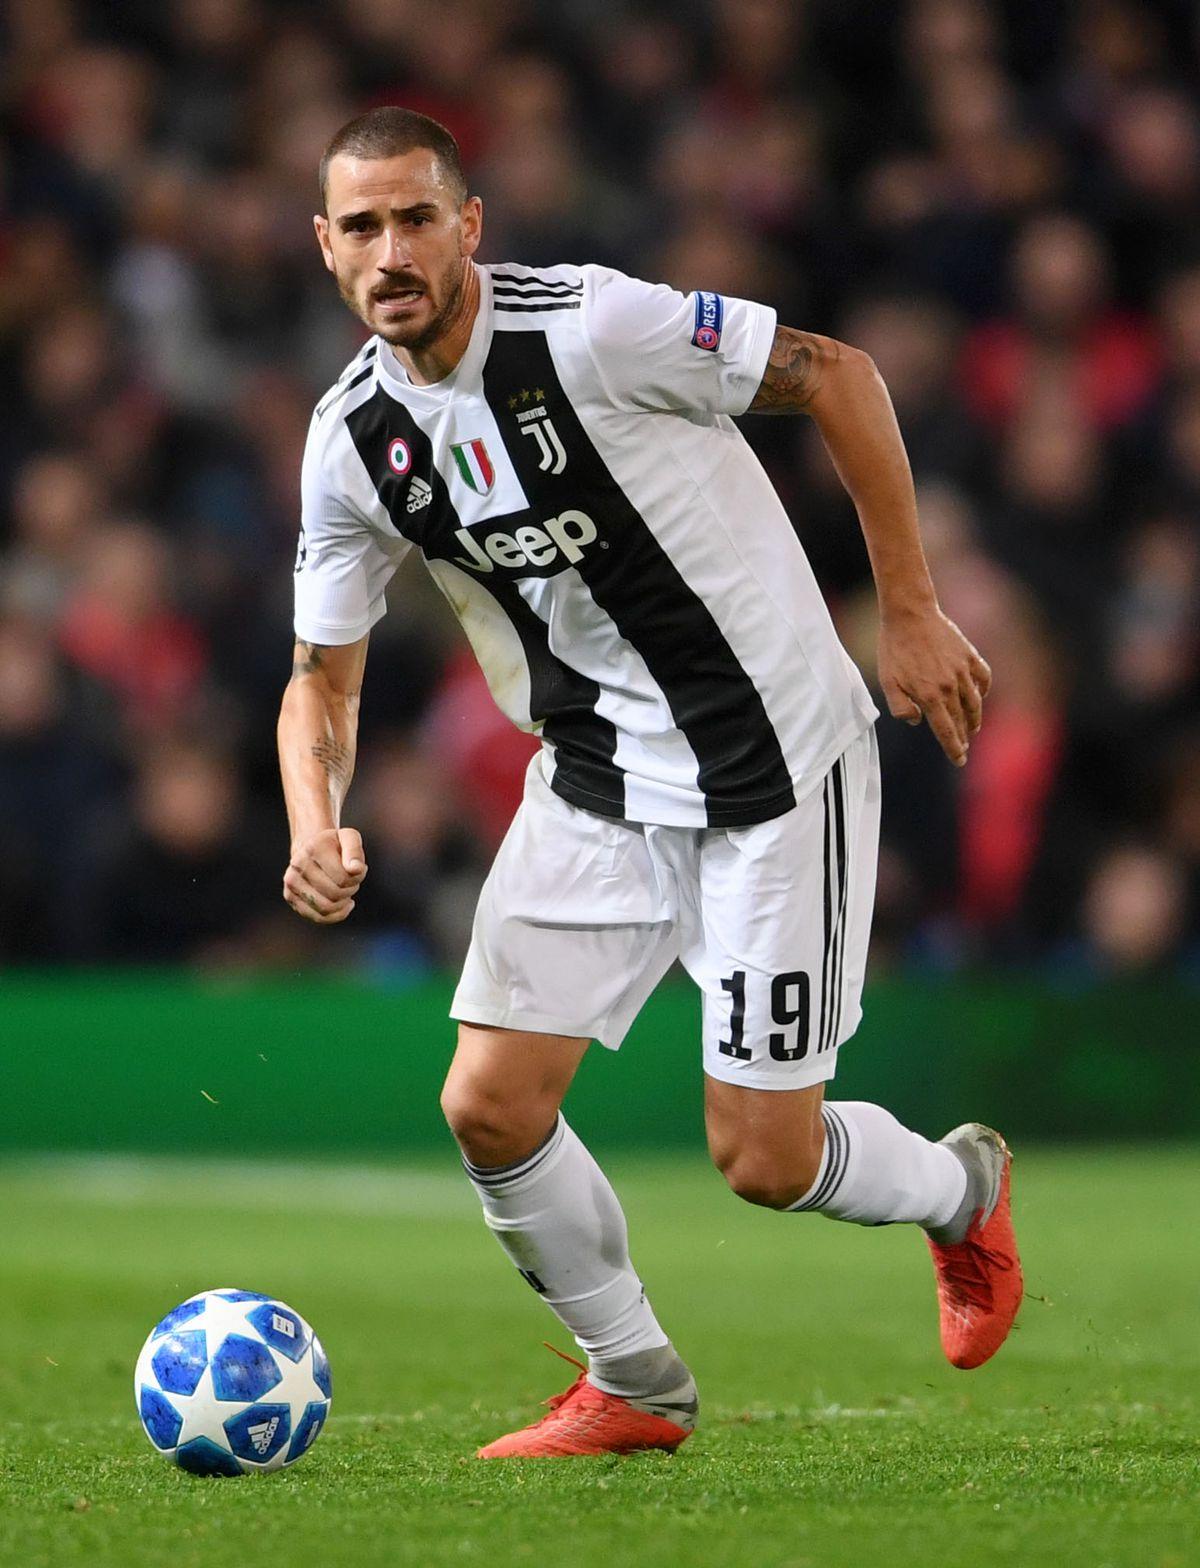 Leonardo Bonucci runs with the ball - Juventus - UEFA Champions League Group H